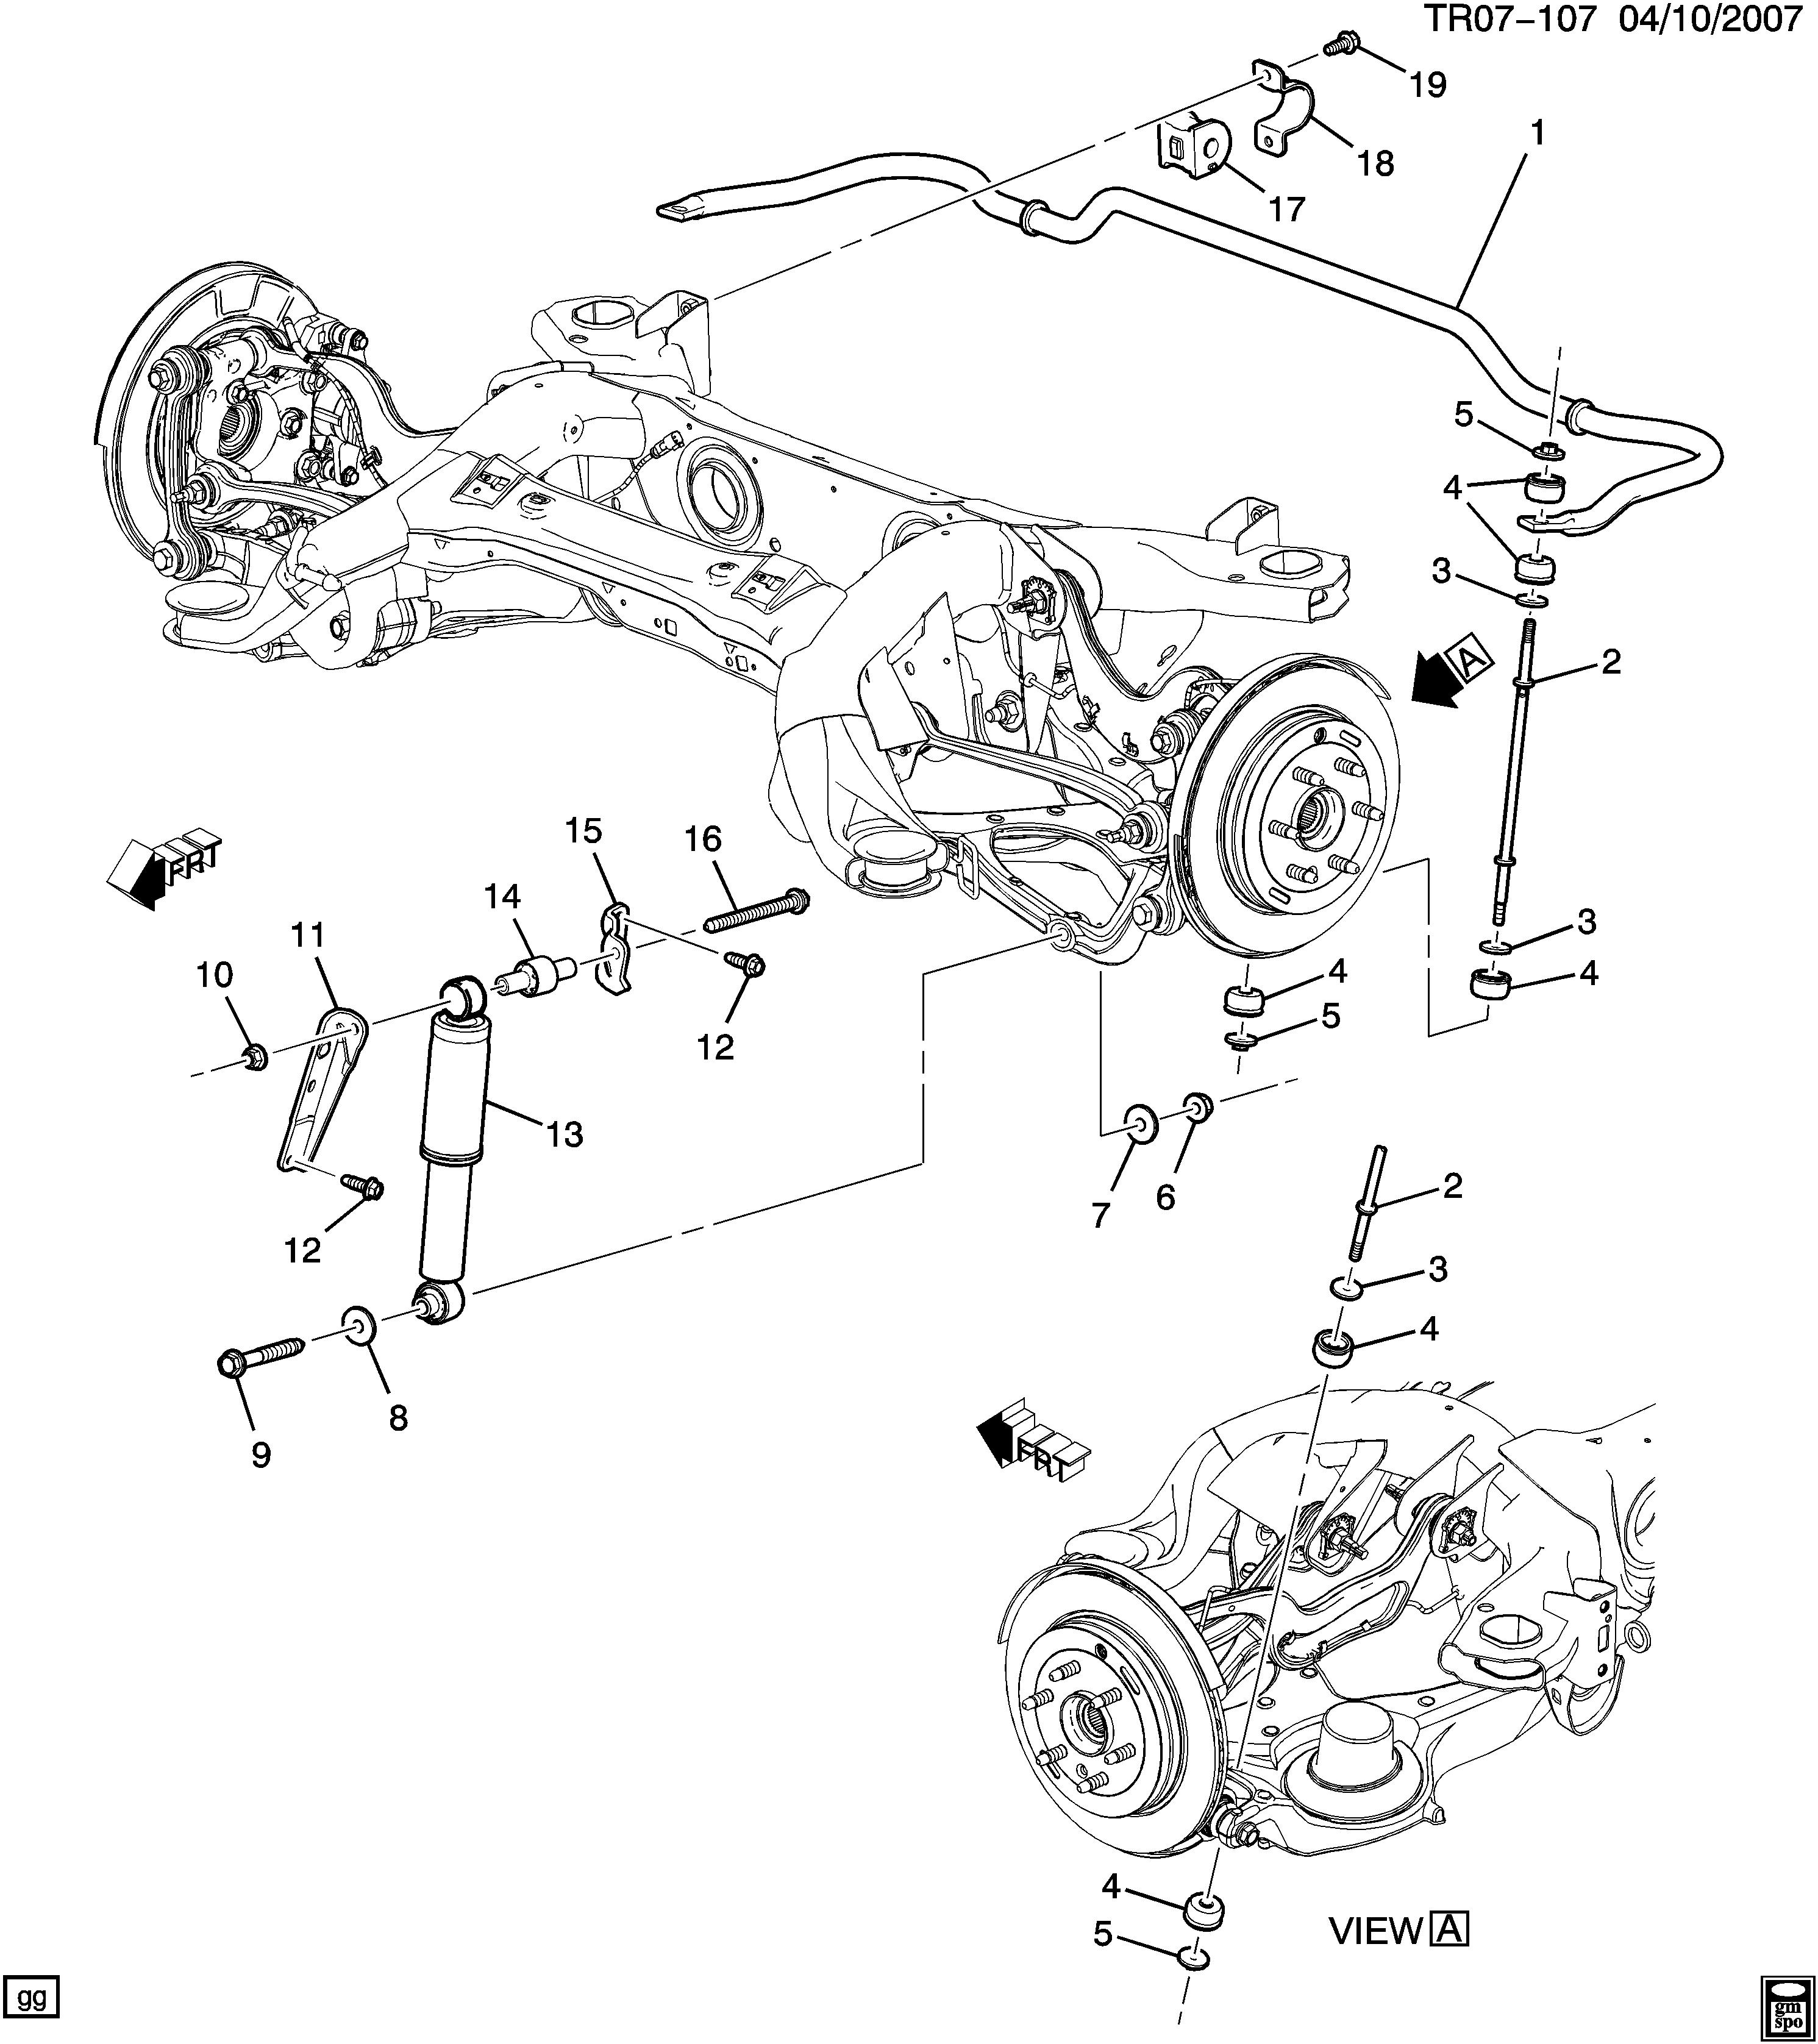 Gmc Acadia Suspension Diagram Wiring Diagram Schematic State Make A State Make A Aliceviola It